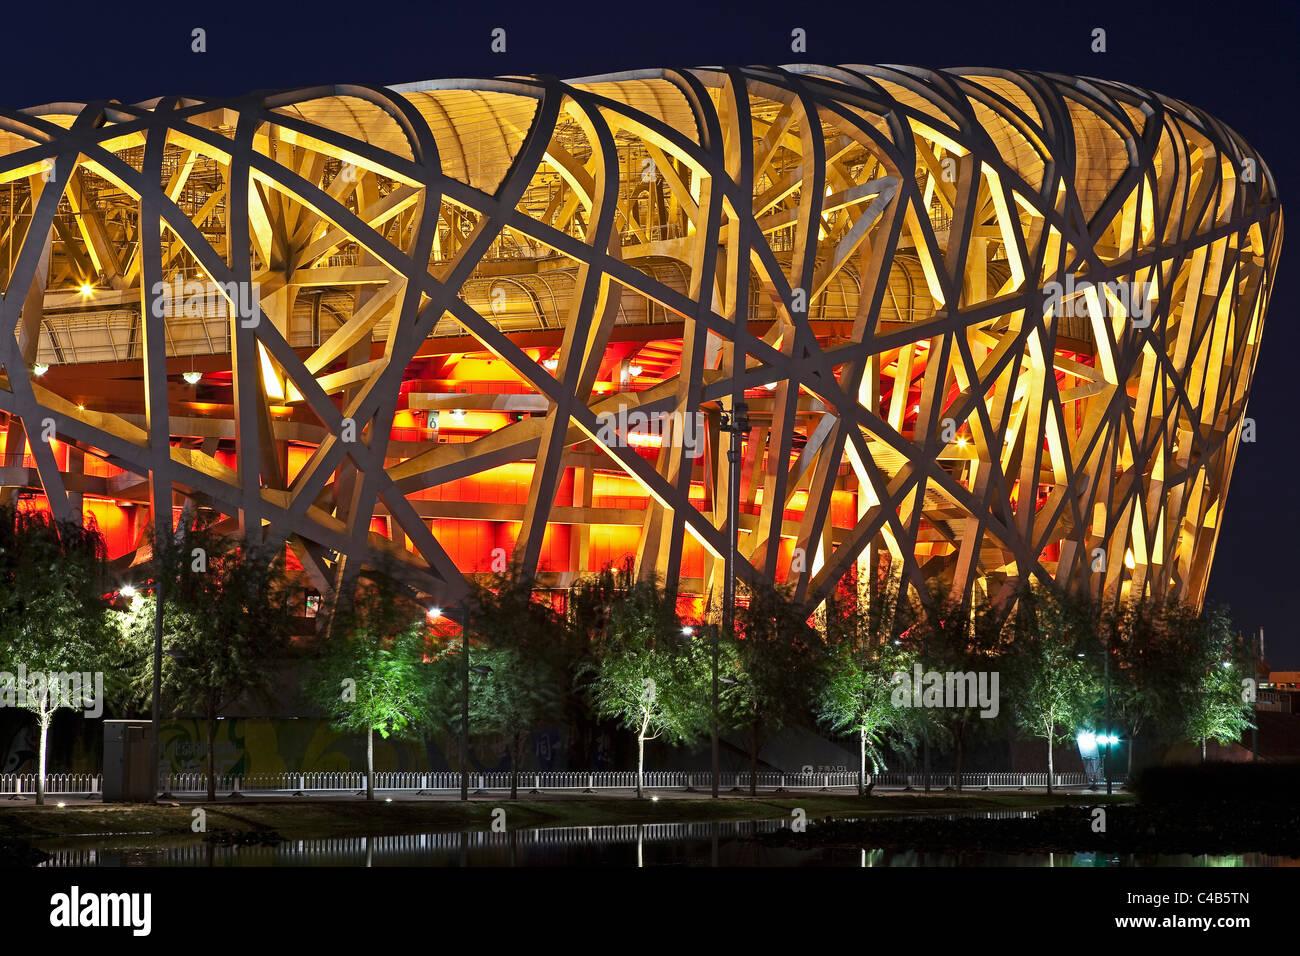 Exterior of the Olympic Stadium, Datun, Beijing, China by night - Stock Image